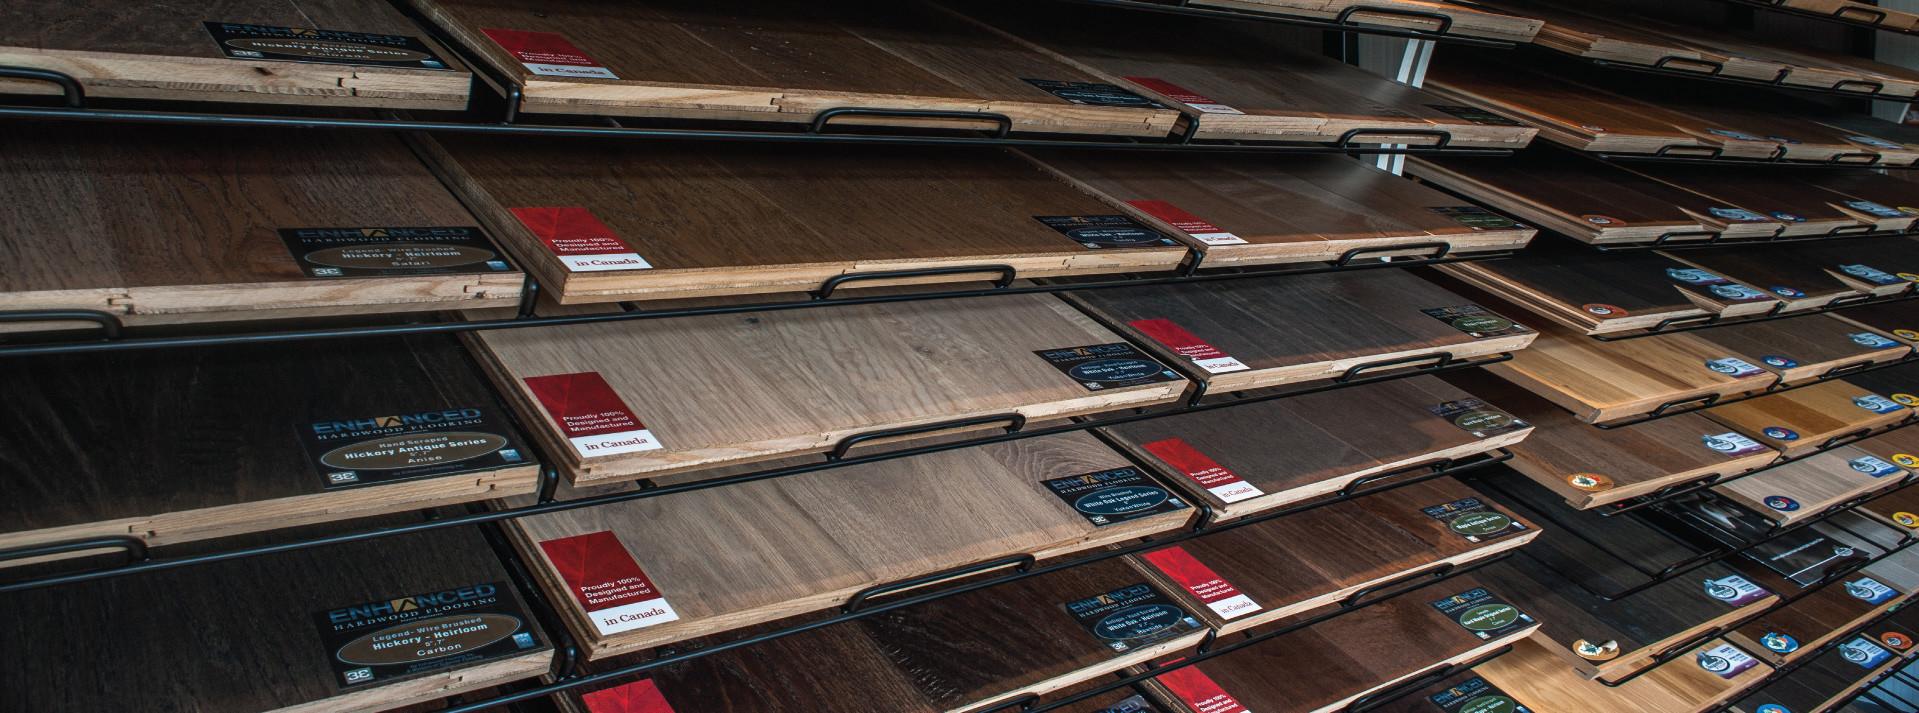 canadian hardwood flooring manufacturers list of higgins hardwood flooring in peterborough oshawa lindsay ajax within office hours